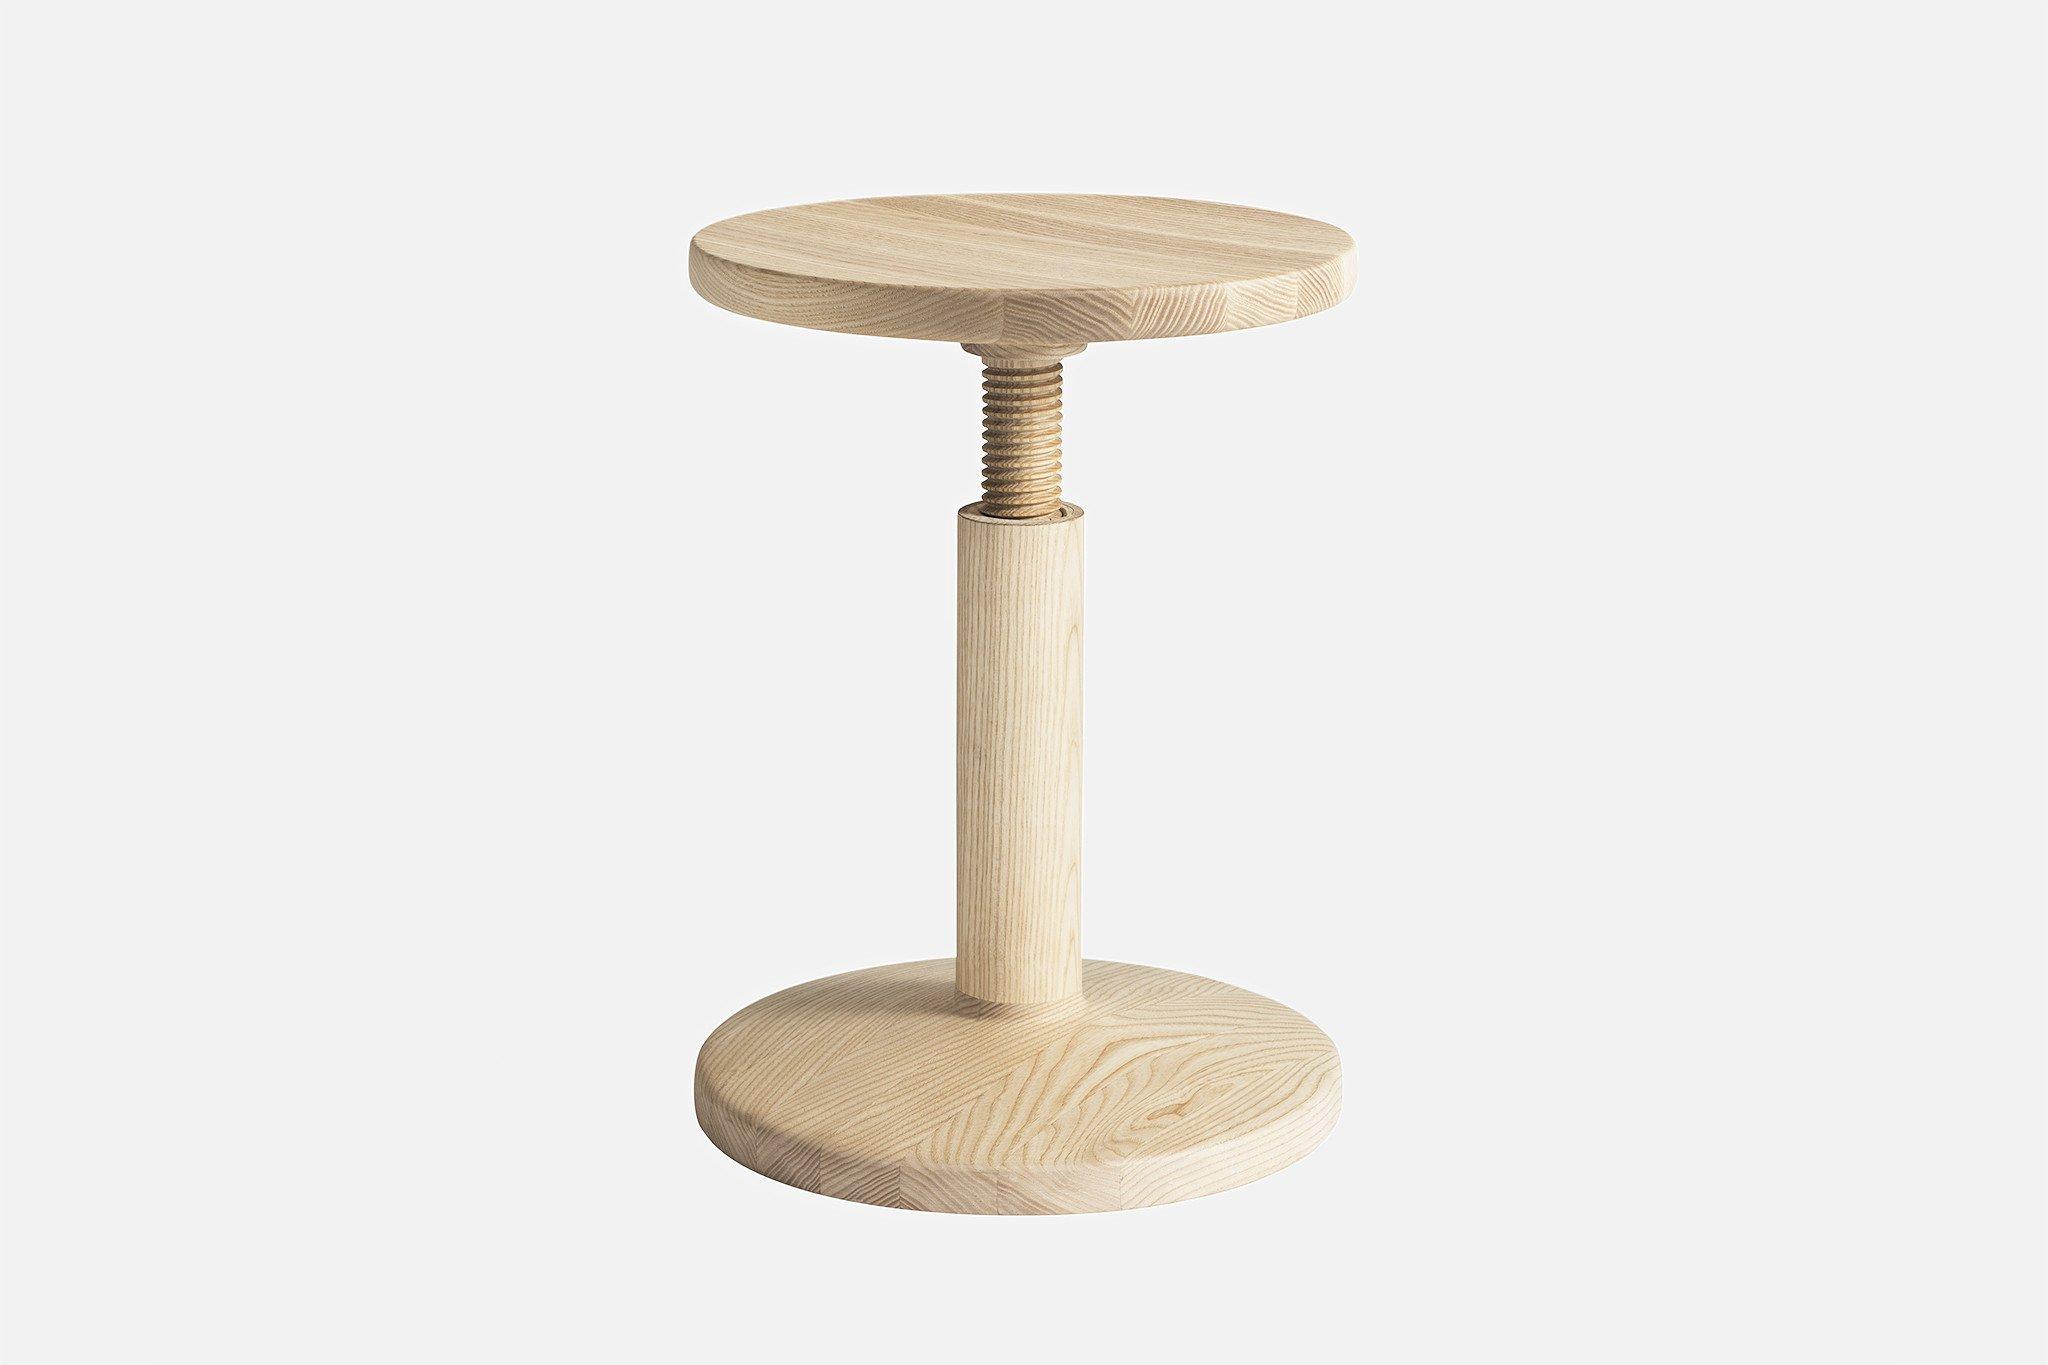 Tabouret All Wood Stool Par Karoline Fesser Guten Morgwen